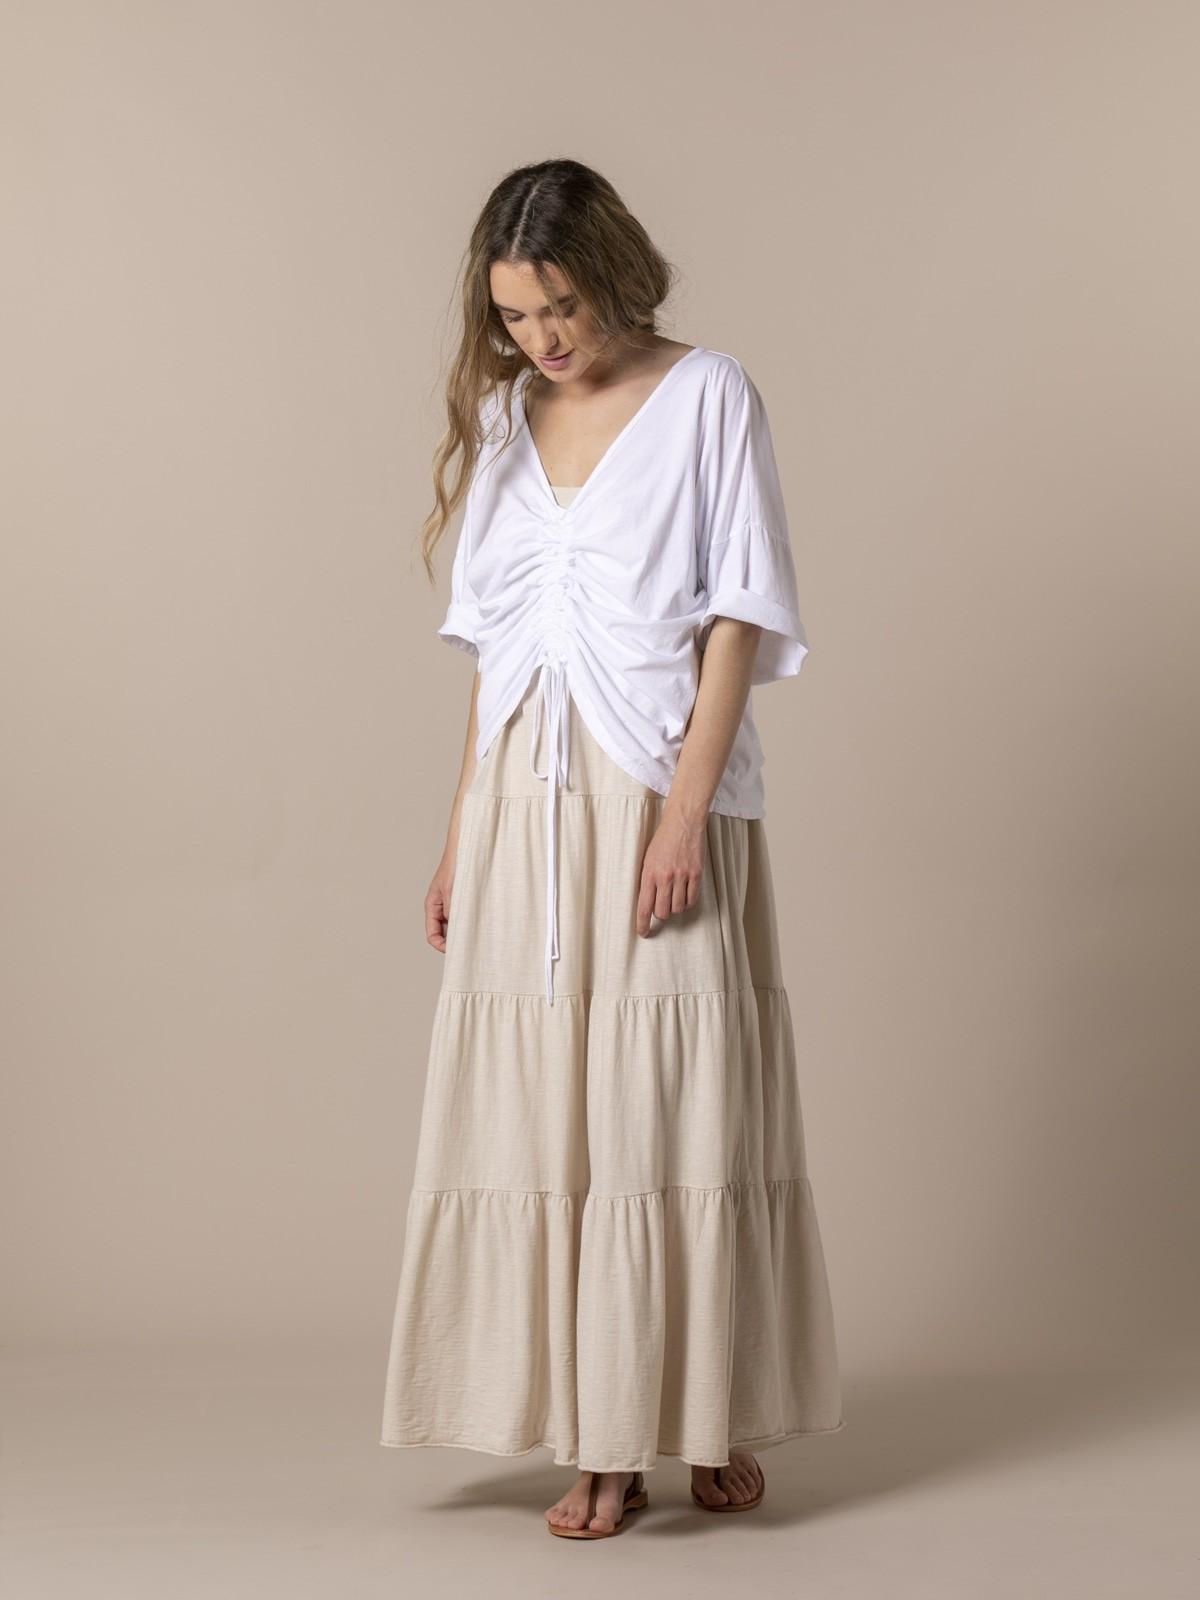 Camiseta mujer ajustable algodón Blanco